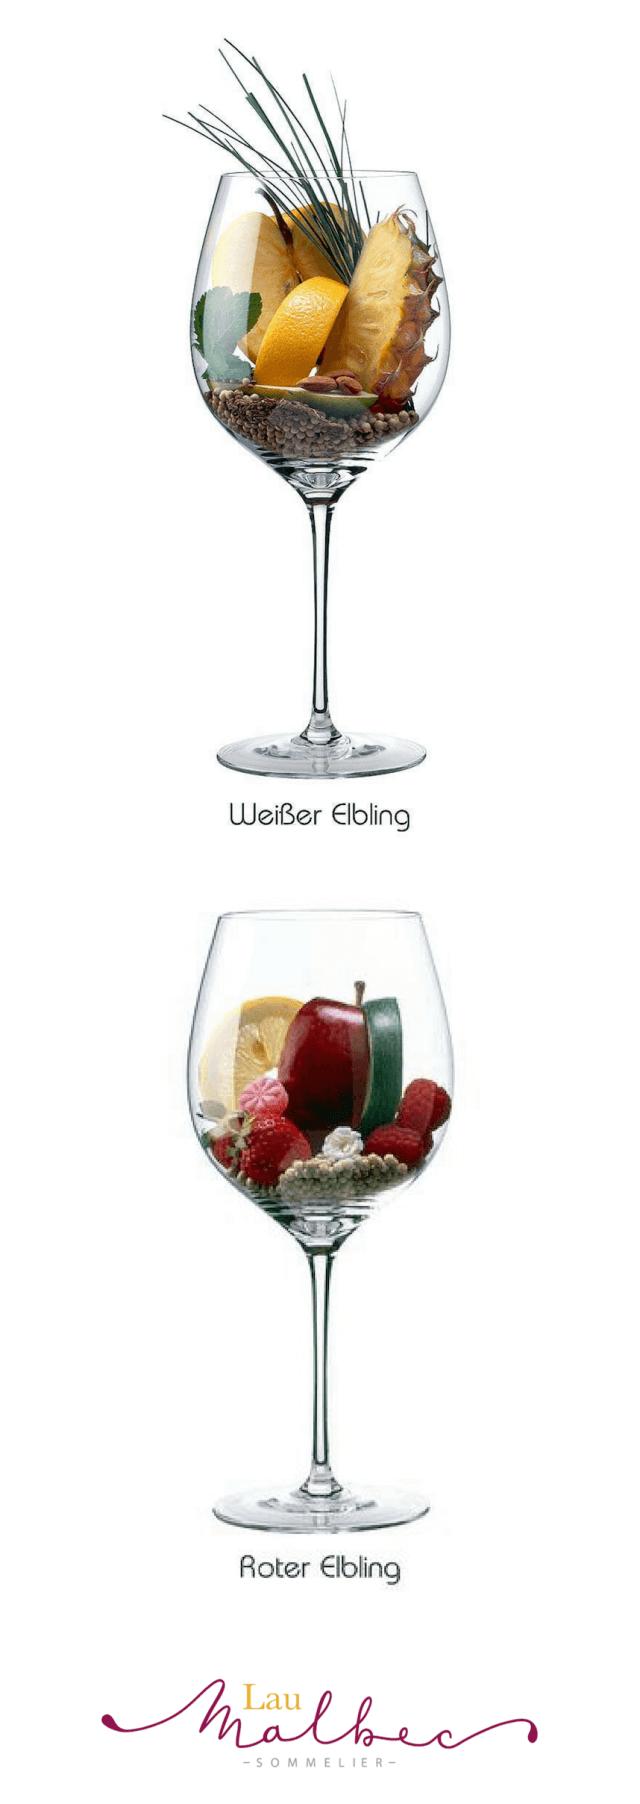 wieber elbling, roter elbling, cepa, vino, maridaje, historia